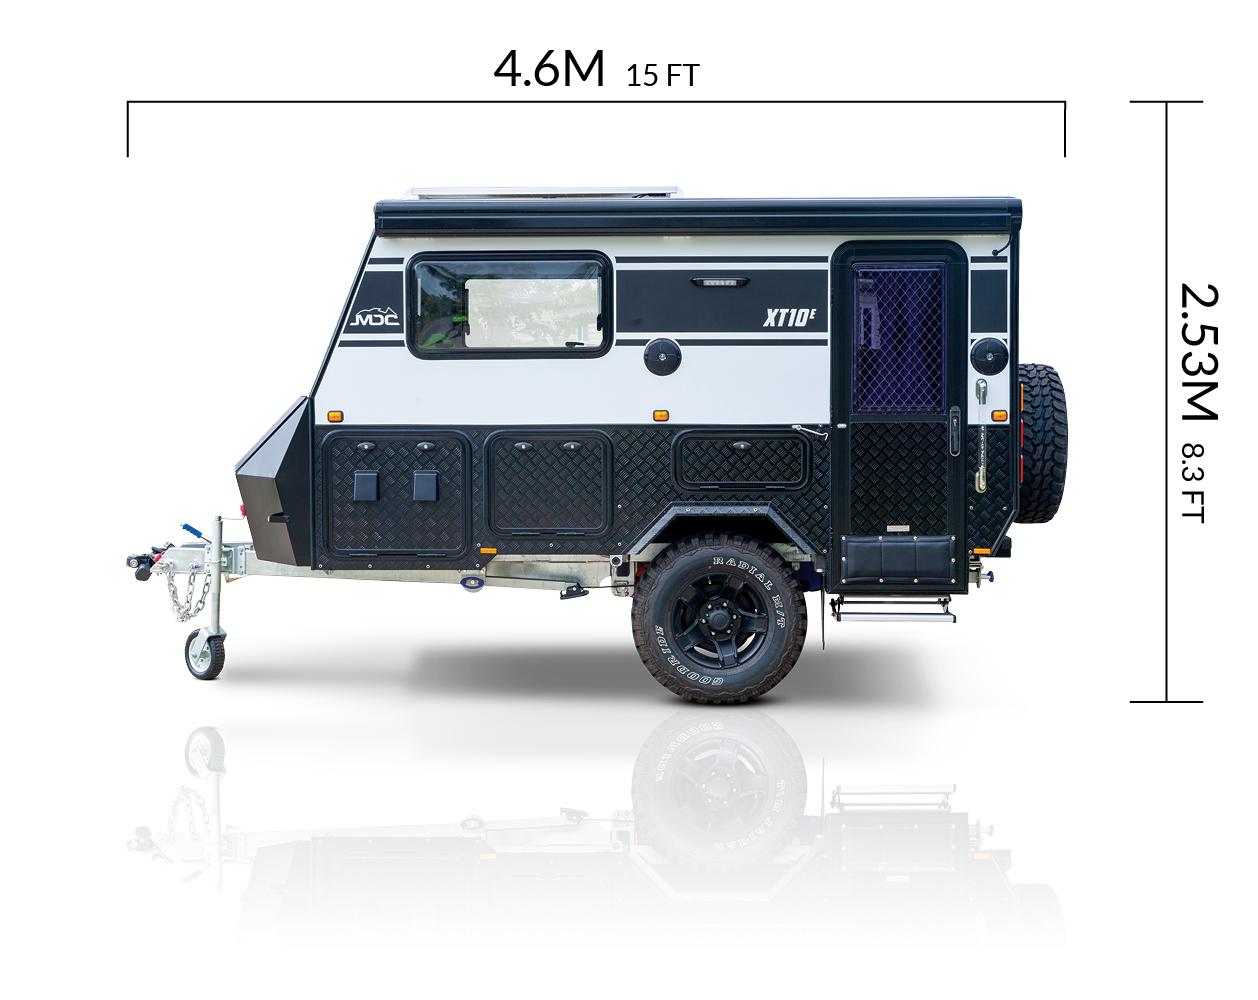 MDC XT10E Offroad Caravan Exterior Side View Width & Height Measurements